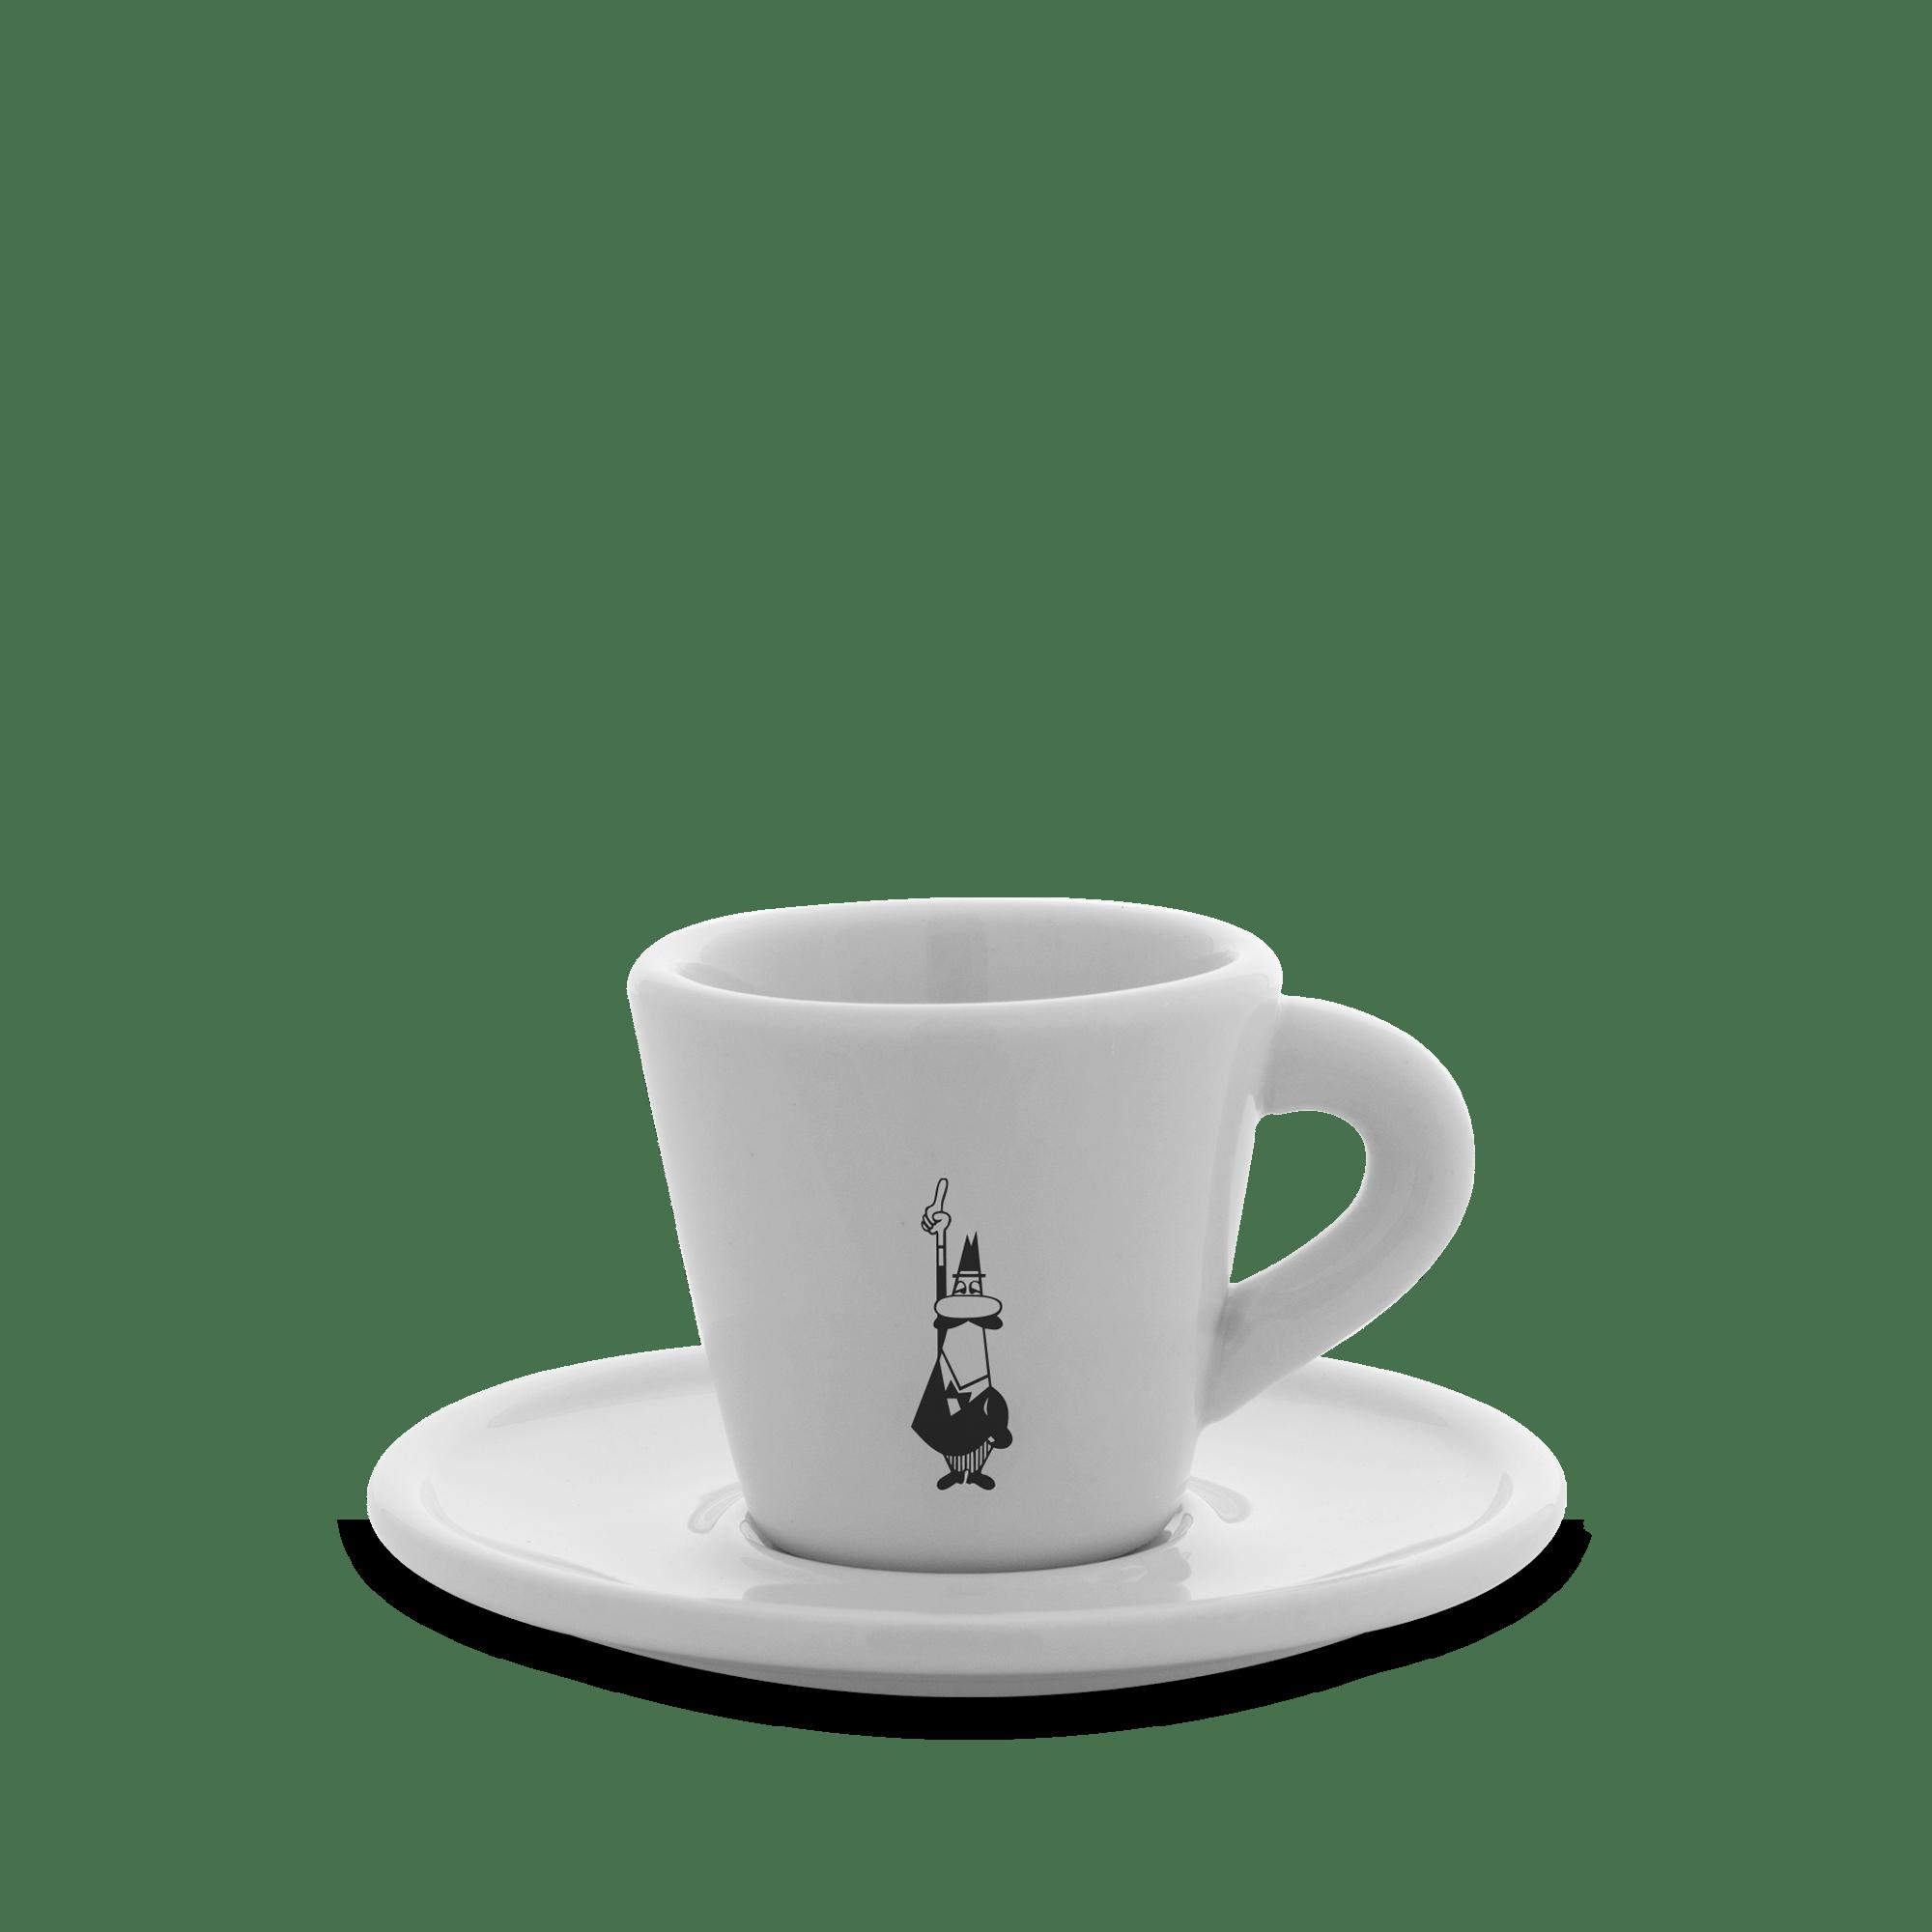 Bialetti Coffee Espresso & Schotel